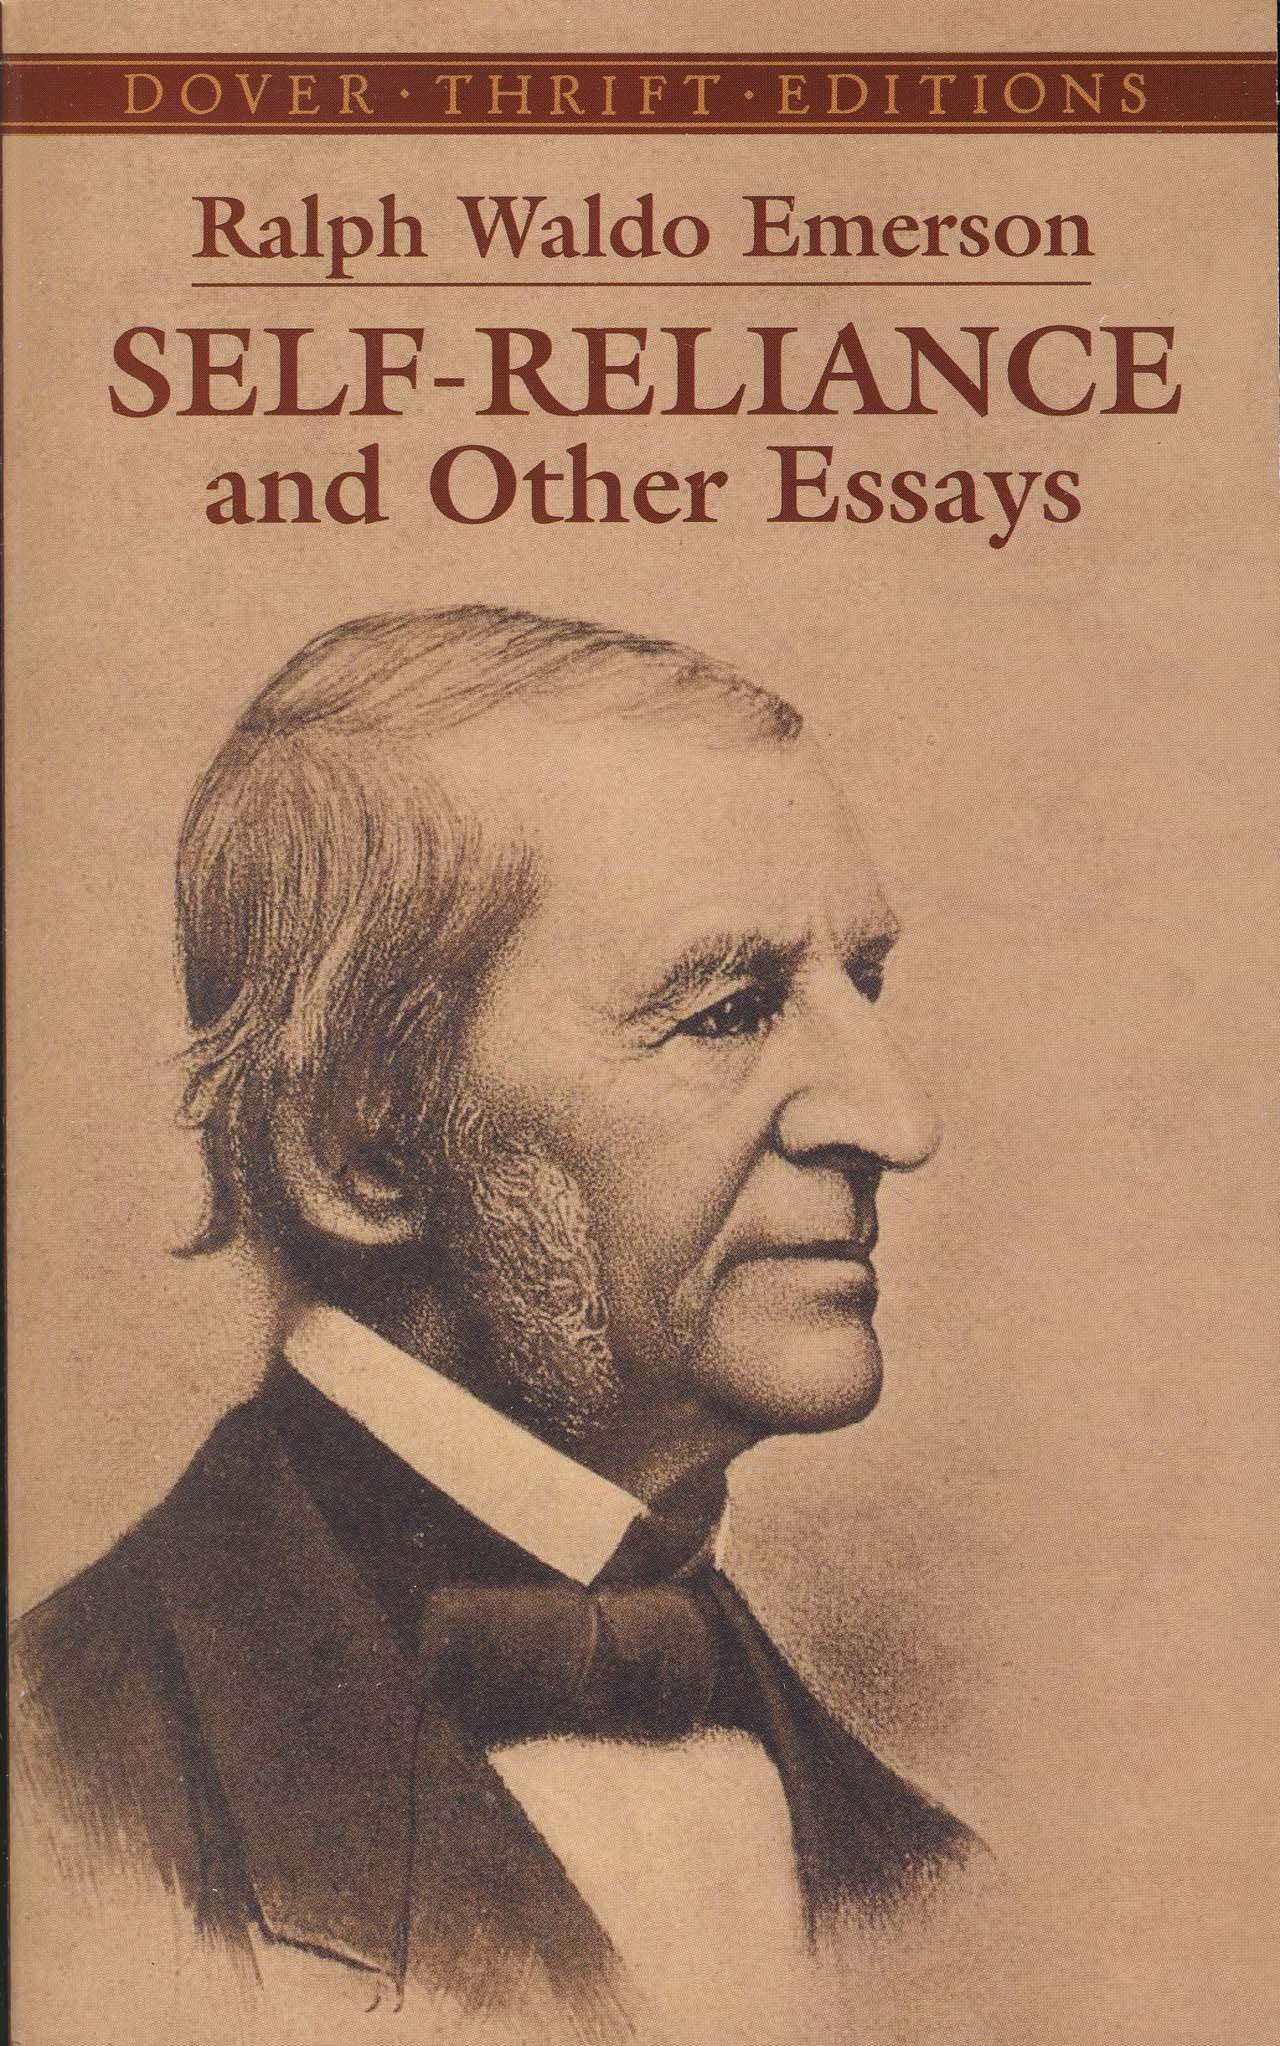 003 91btiwopxal Essay Example Emerson Dreaded Essays Ralph Pdf First Series Summary Waldo Nature Full